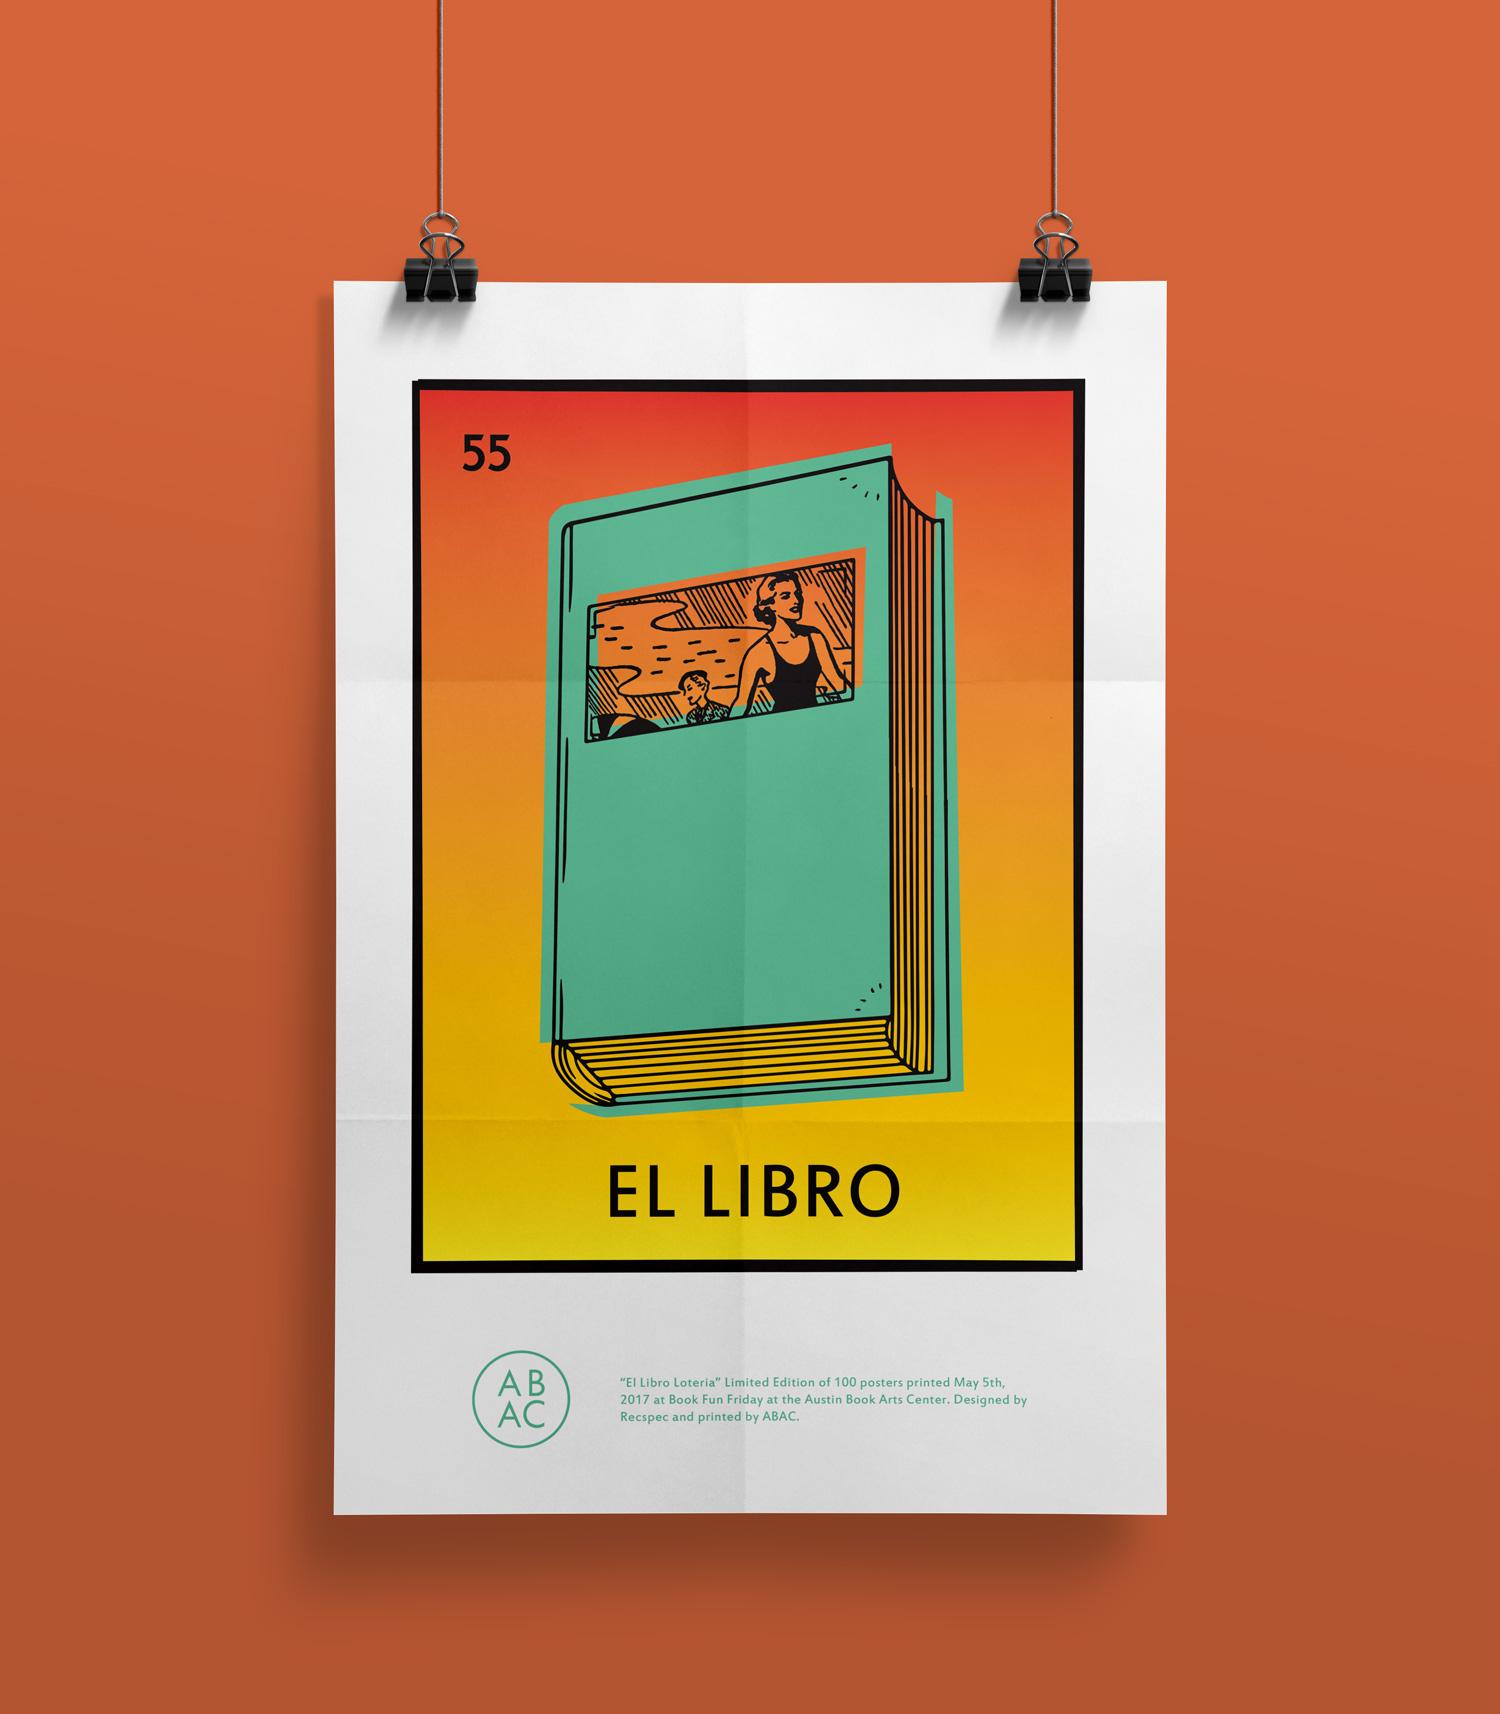 abac_libro_poster